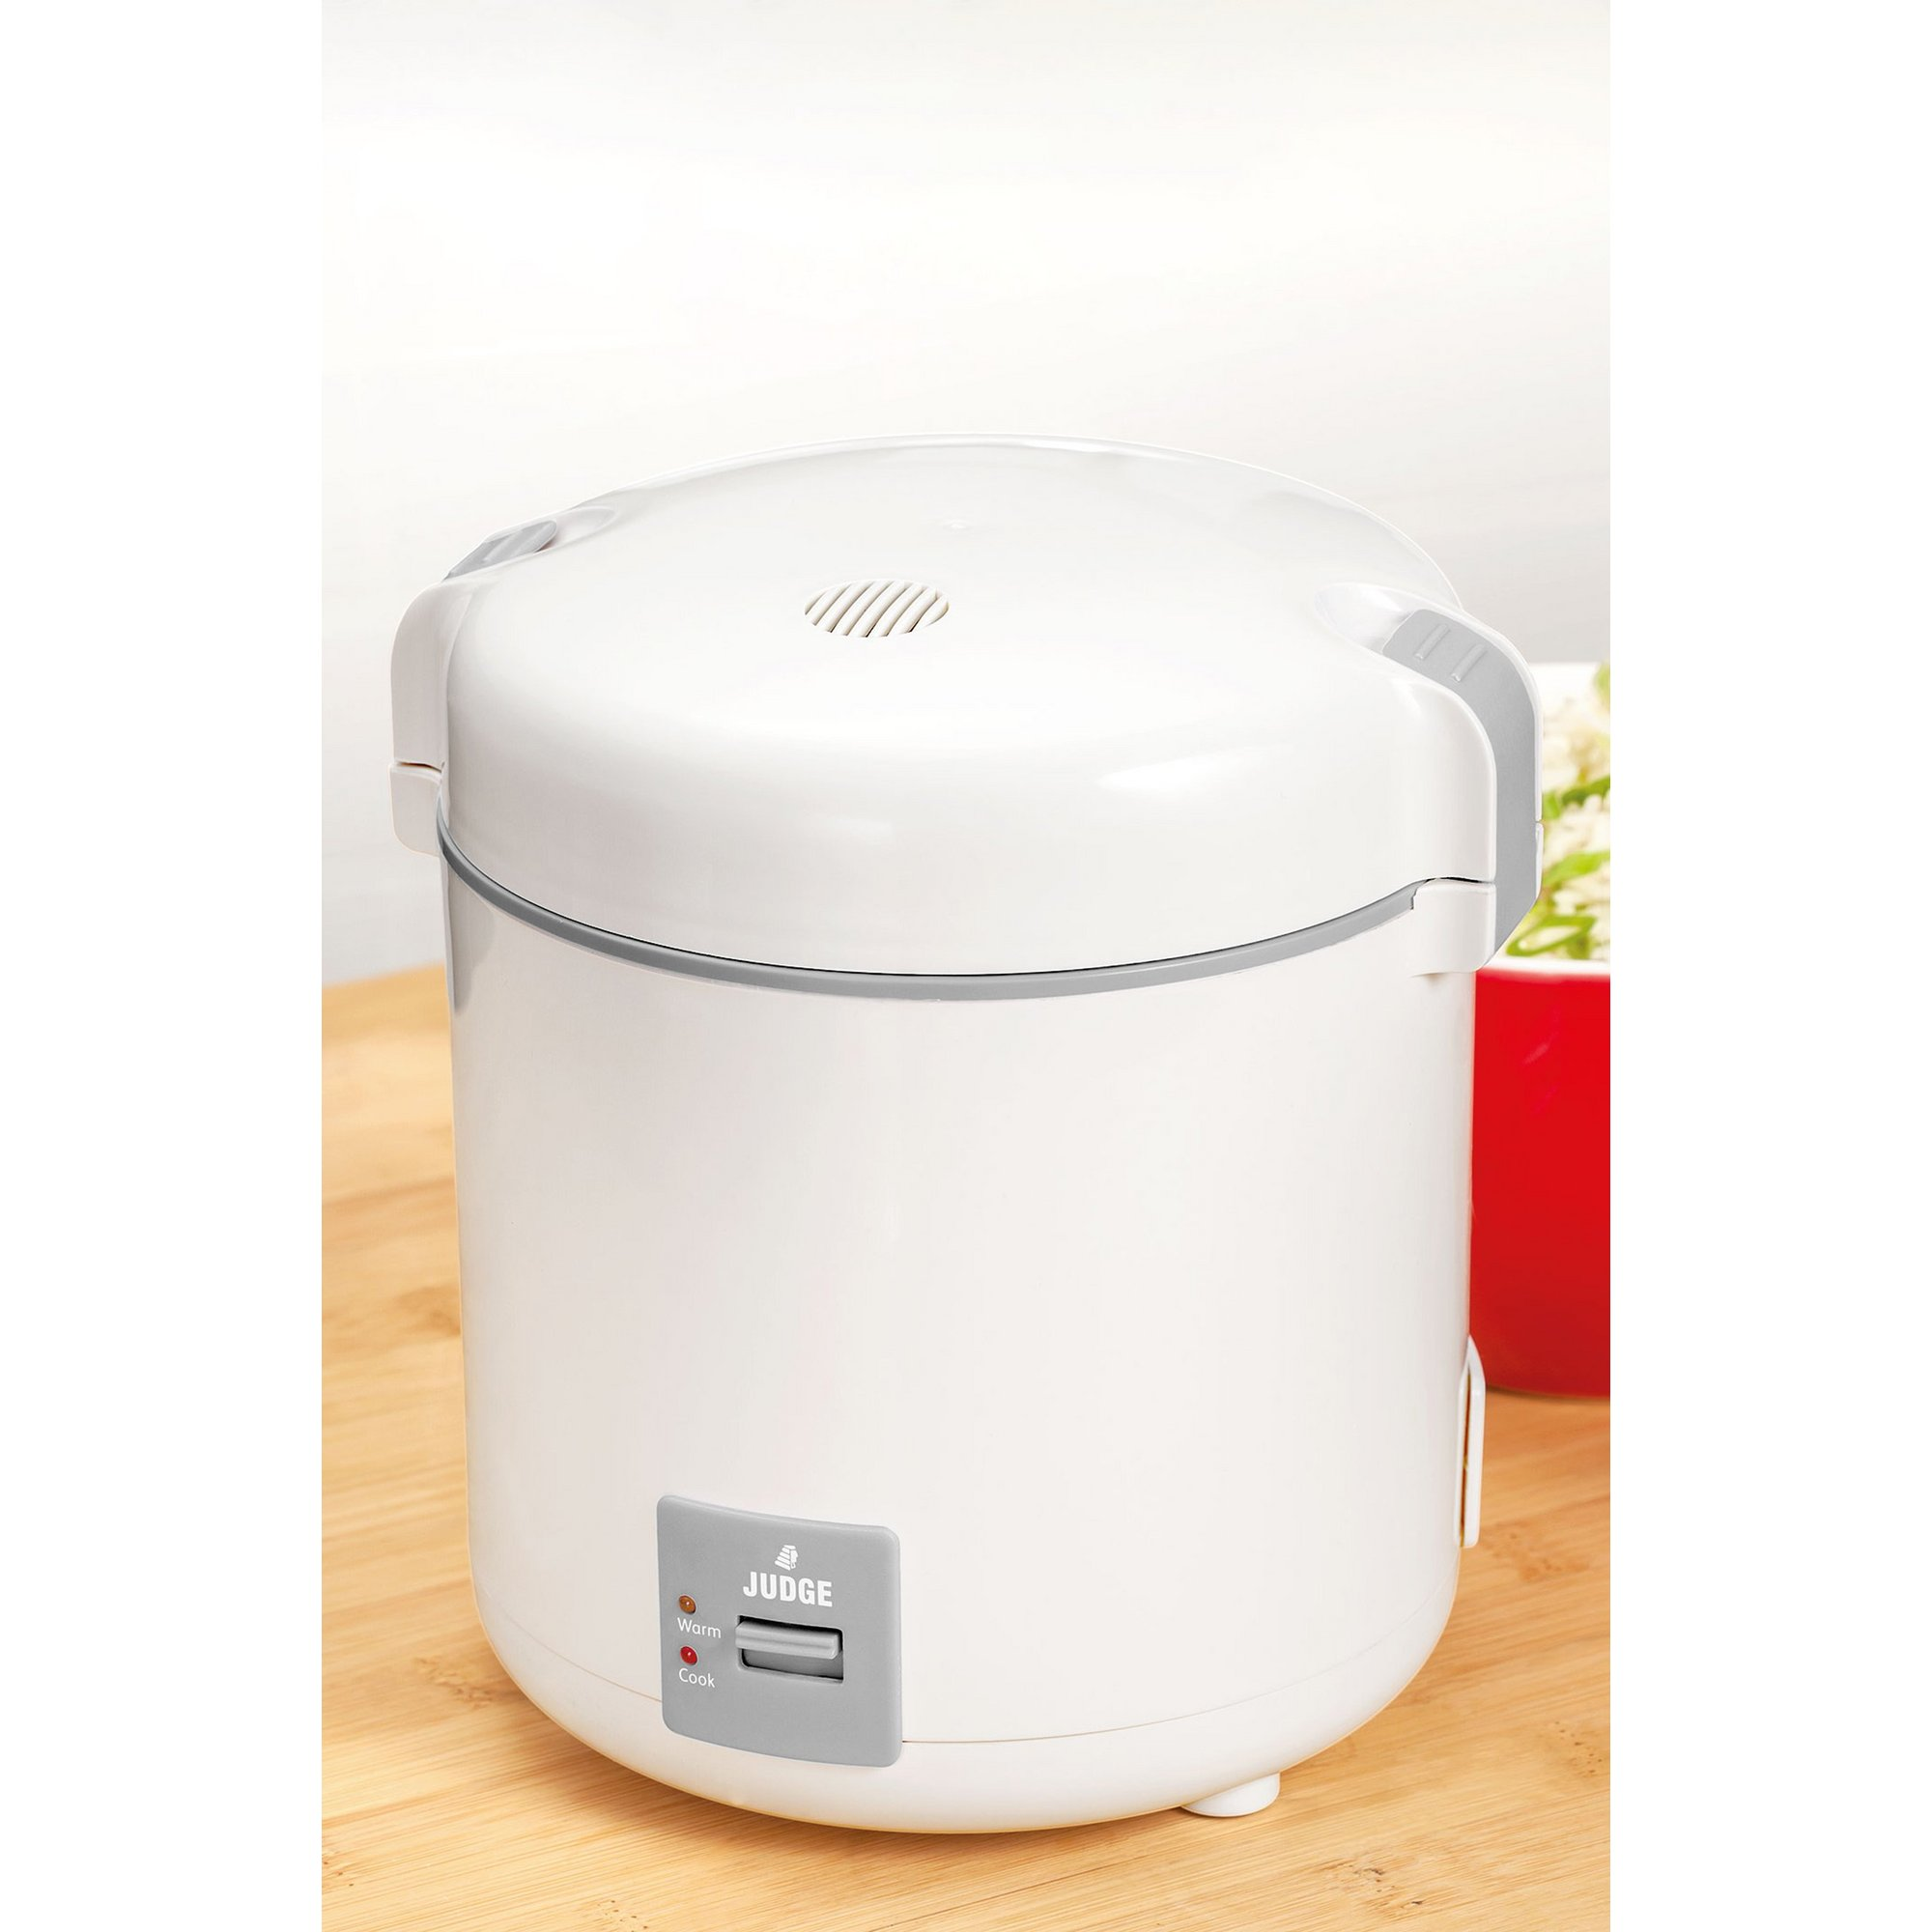 Image of Judge Mini 300ml Rice Cooker